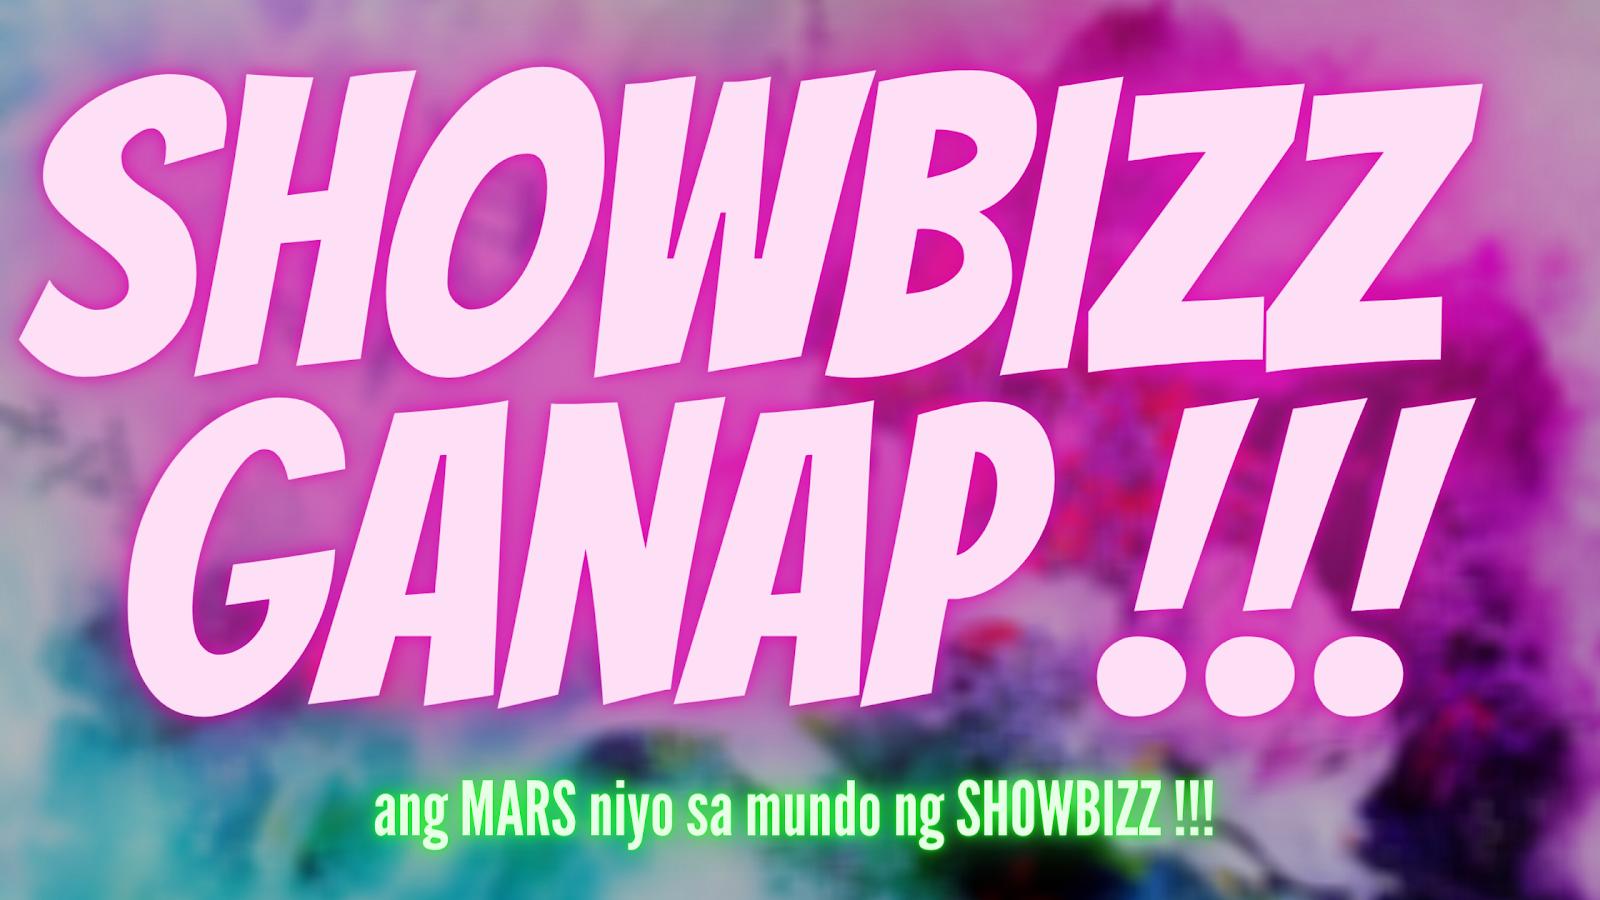 Showbizz Ganap